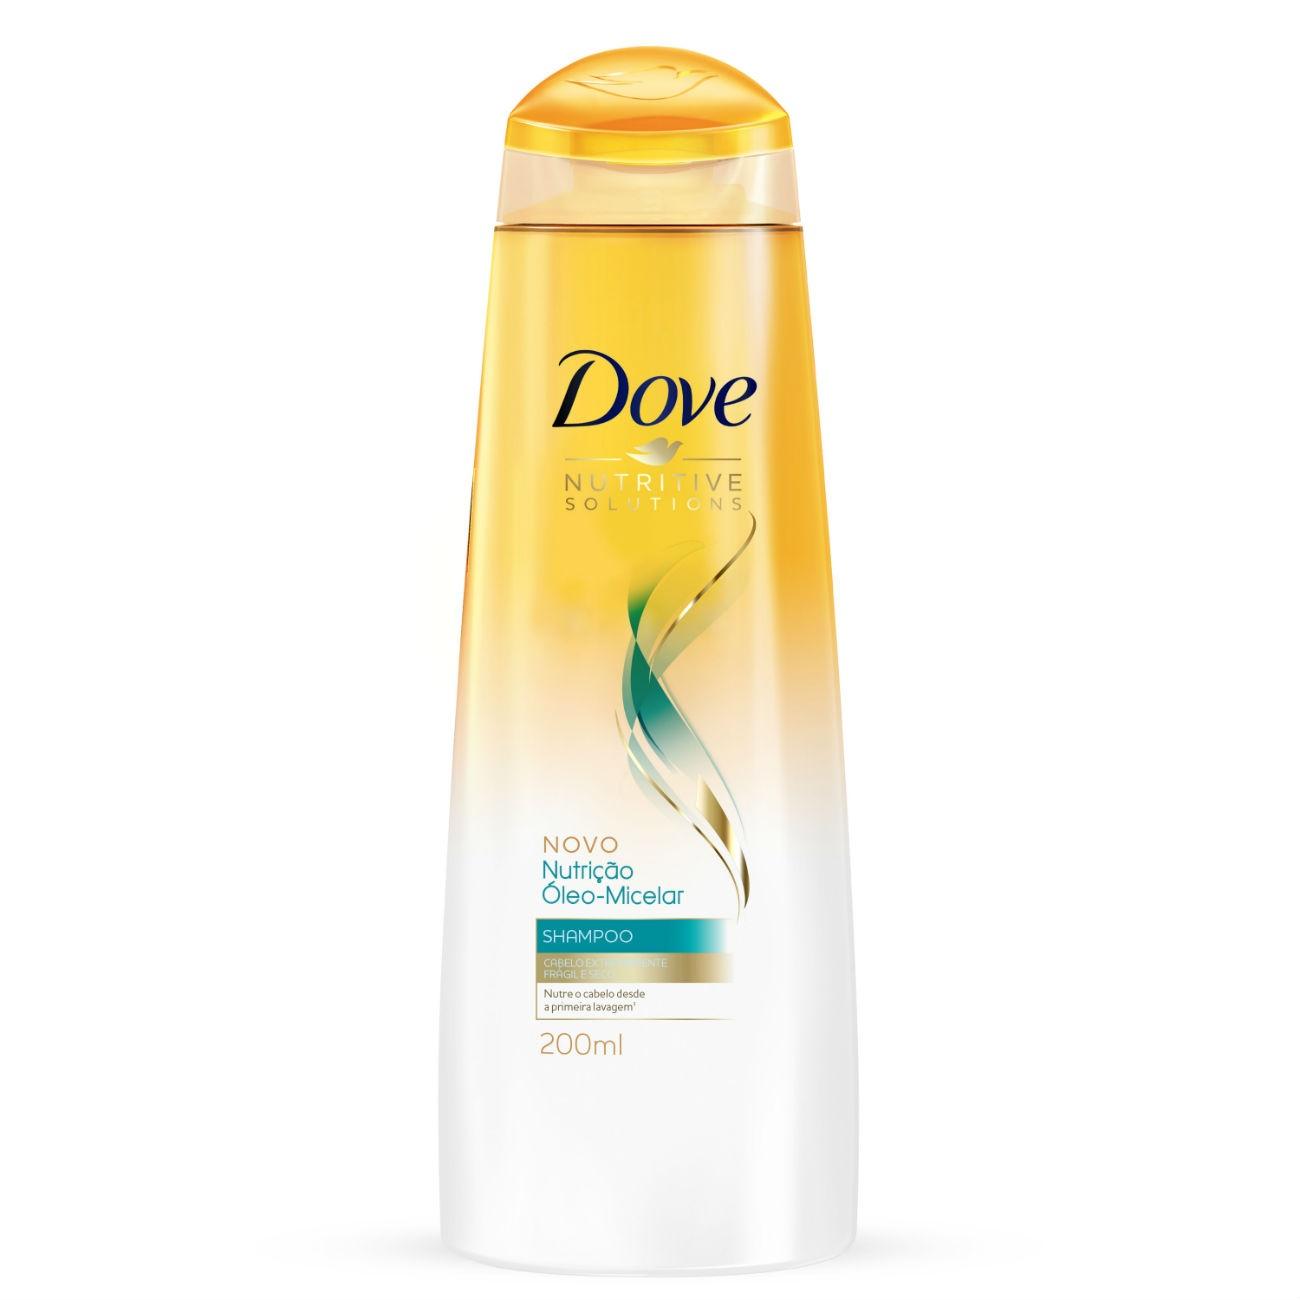 Shampoo Dove Nutri��o �leo-Micelar 200ml